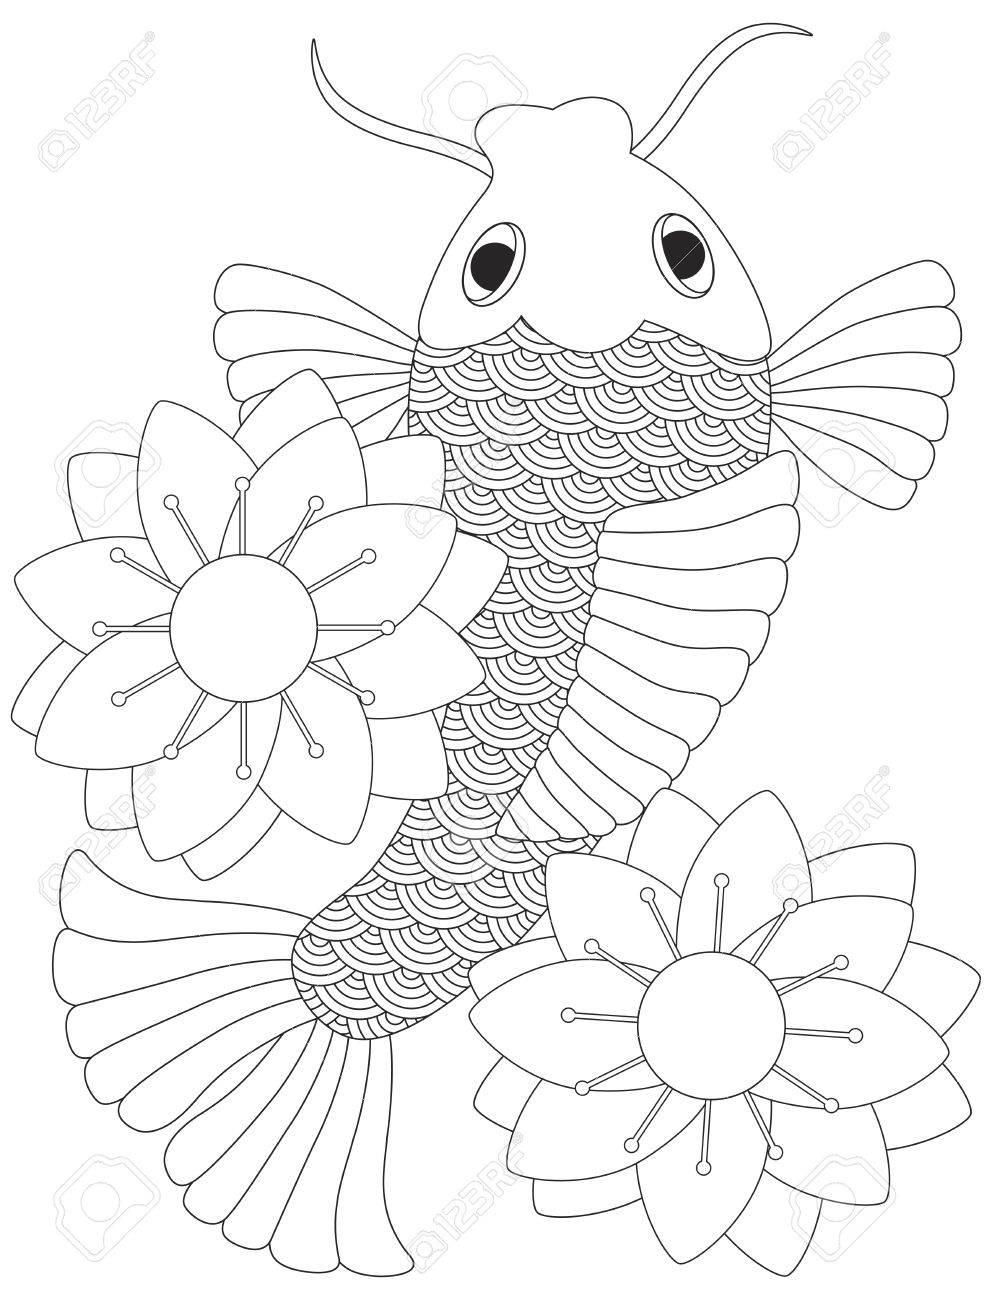 Japanese koi fish or chinese carp with lotus flower line art japanese koi fish or chinese carp with lotus flower line art illustration isolated on white background izmirmasajfo